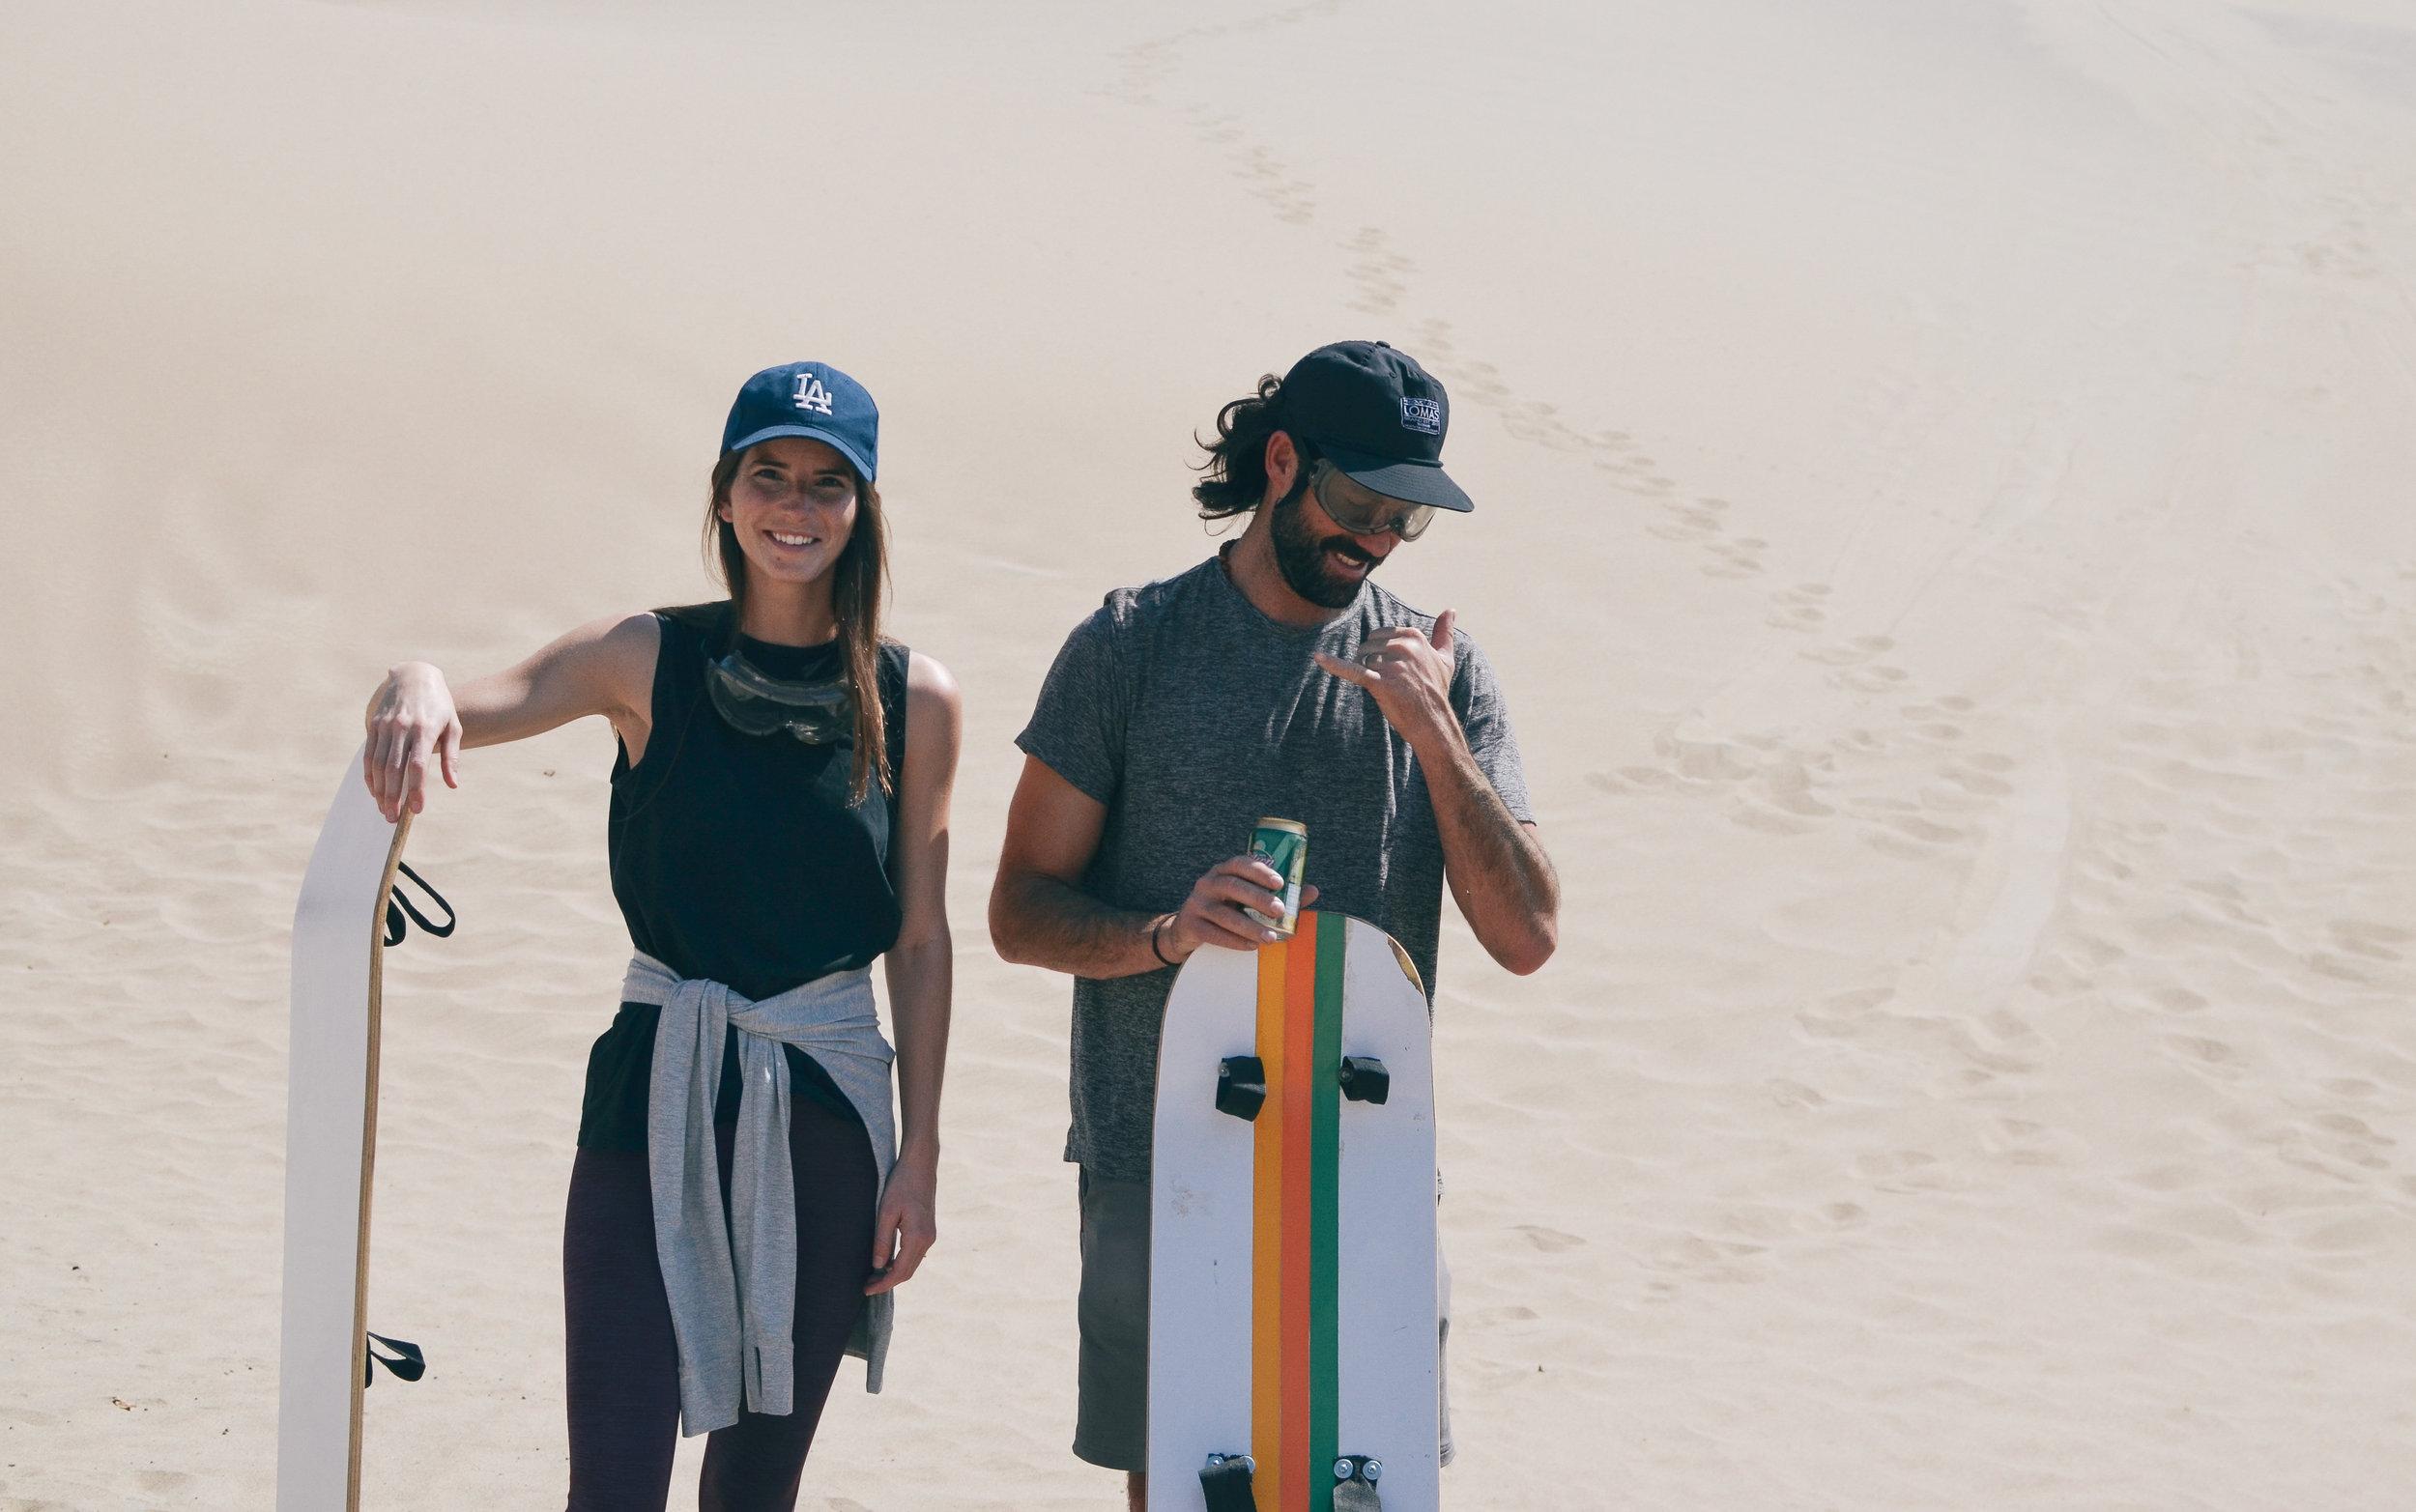 huacachina+sand+boarding+peru+travel+guide+life+on+pine+blog +exchange_DSC_1798.jpg